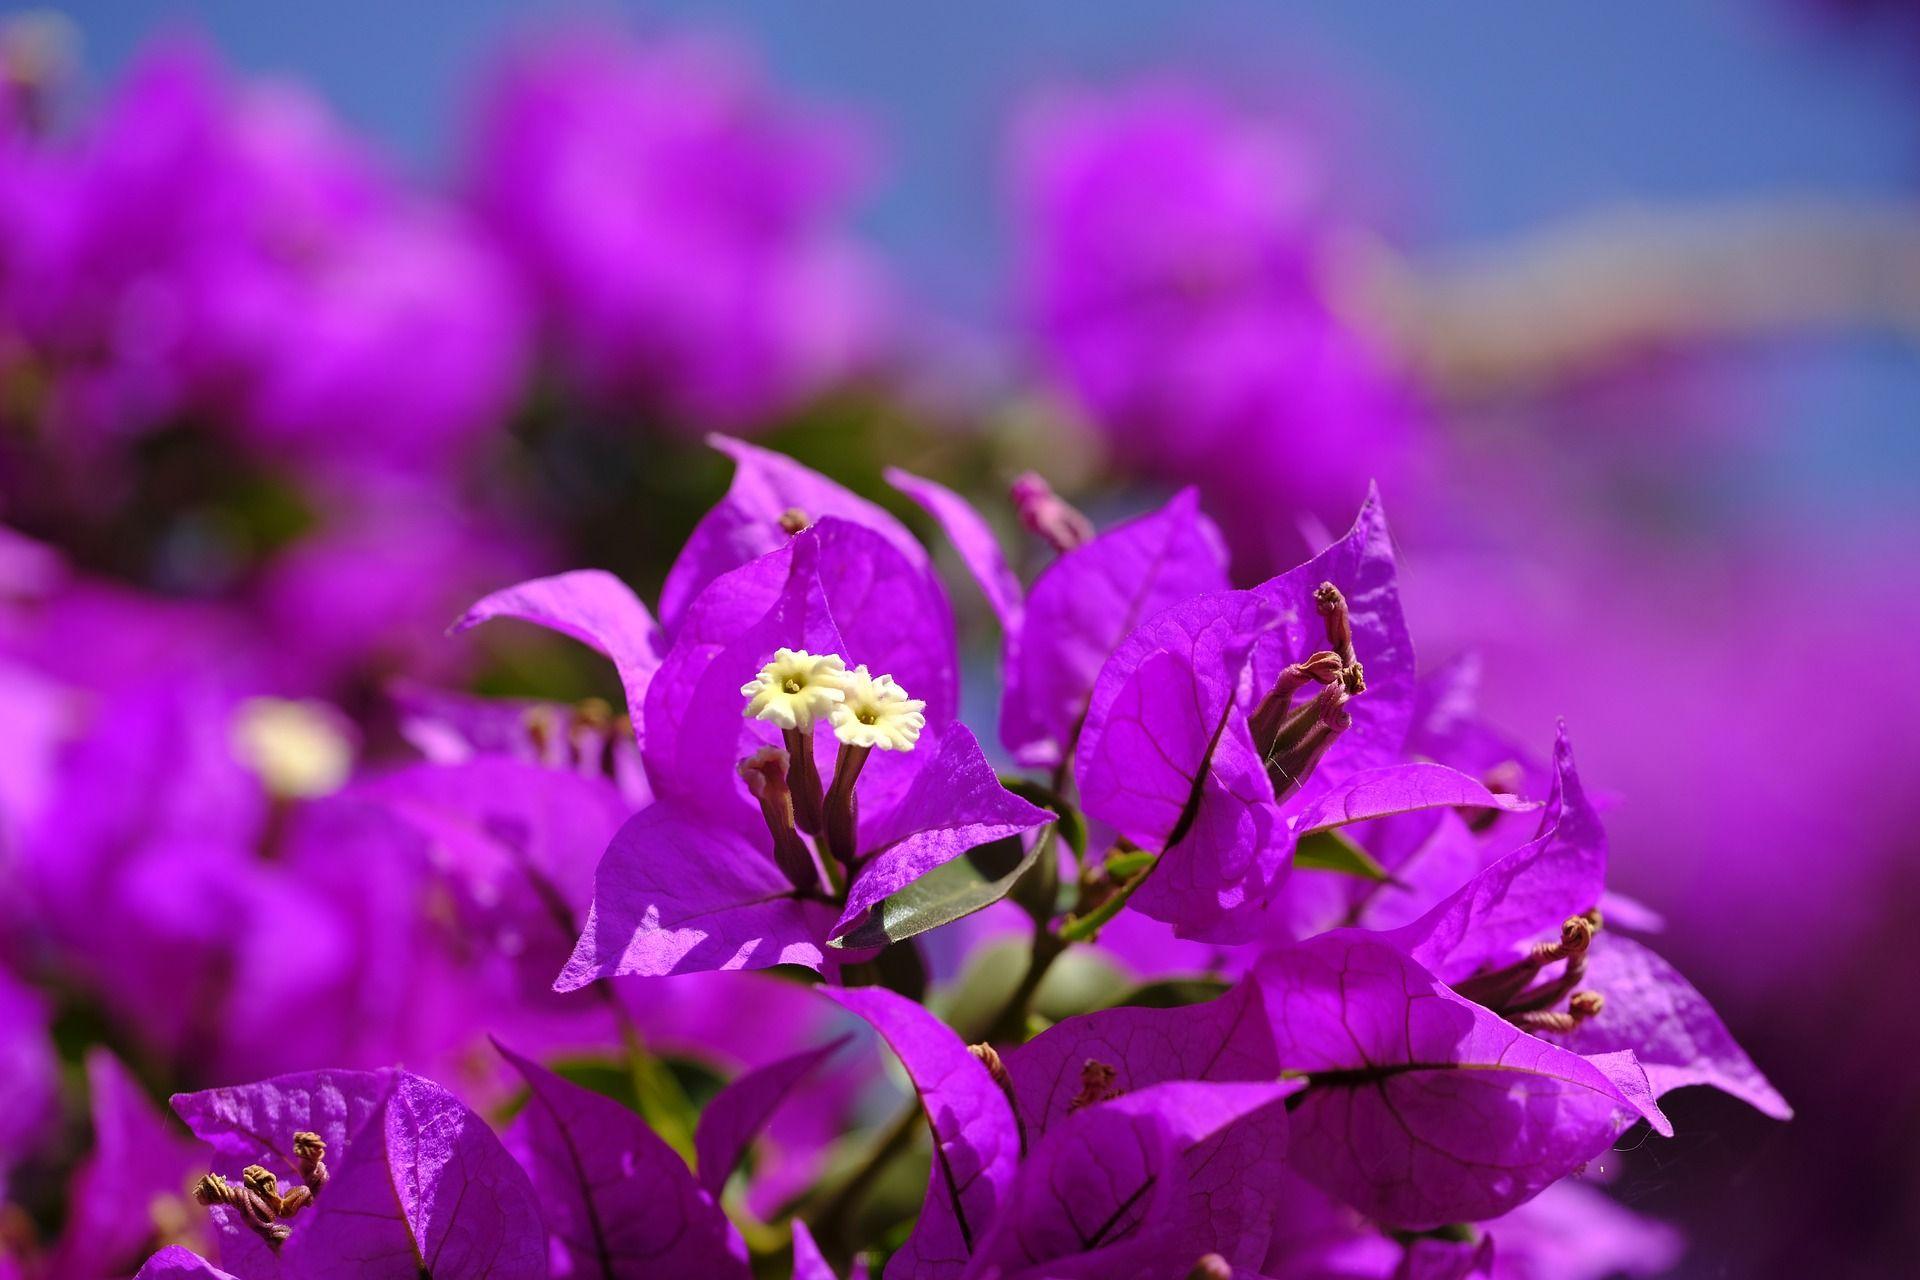 Deskripsi Bunga Kertas Kompasiana Com